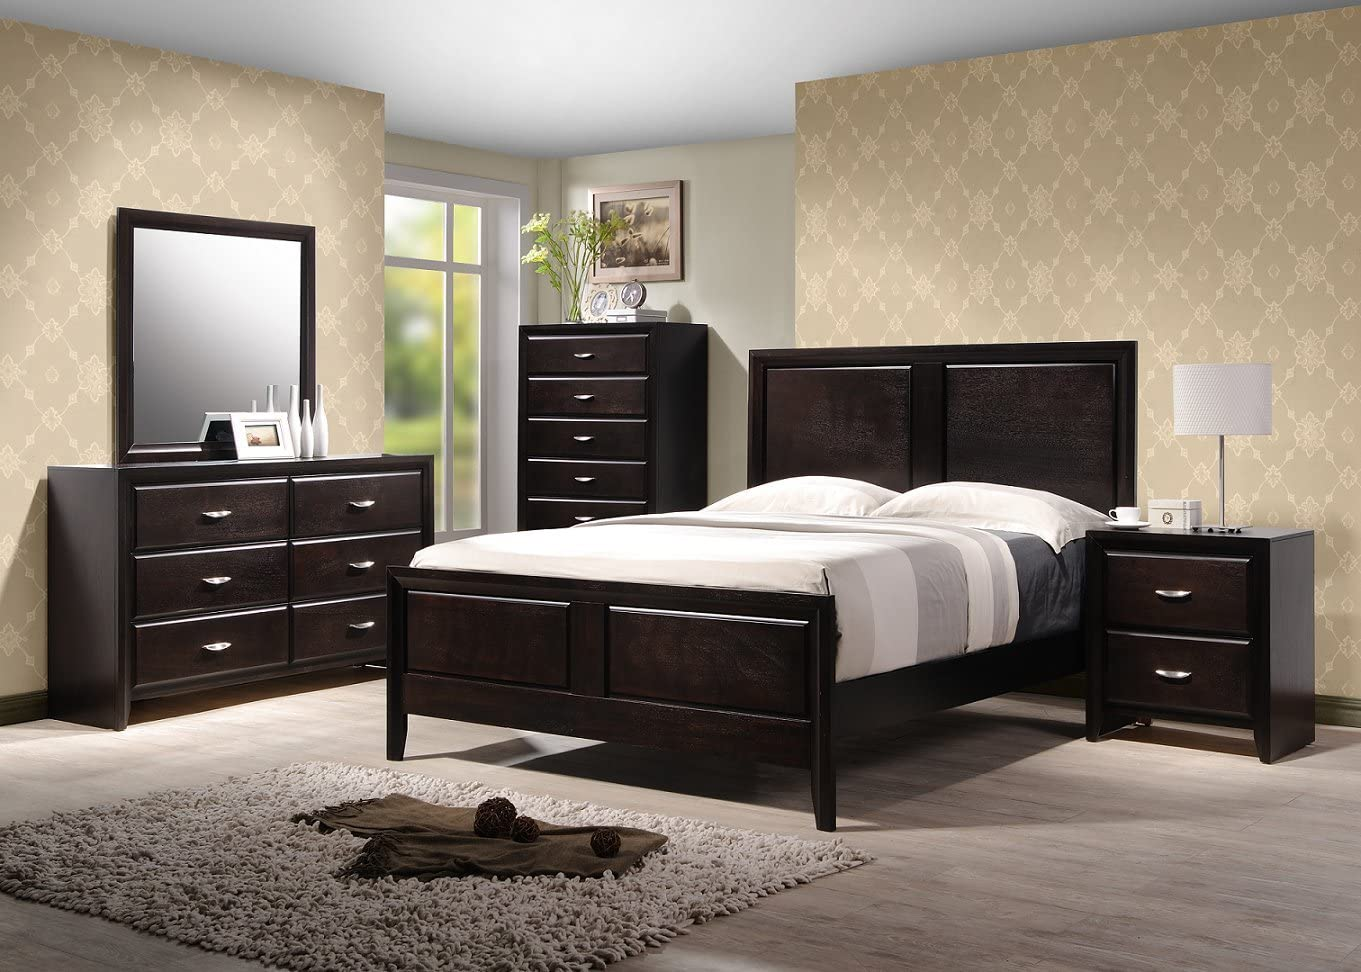 Amazon Com Yuan Tai Adele 5 Piece Bedroom Furniture Set King